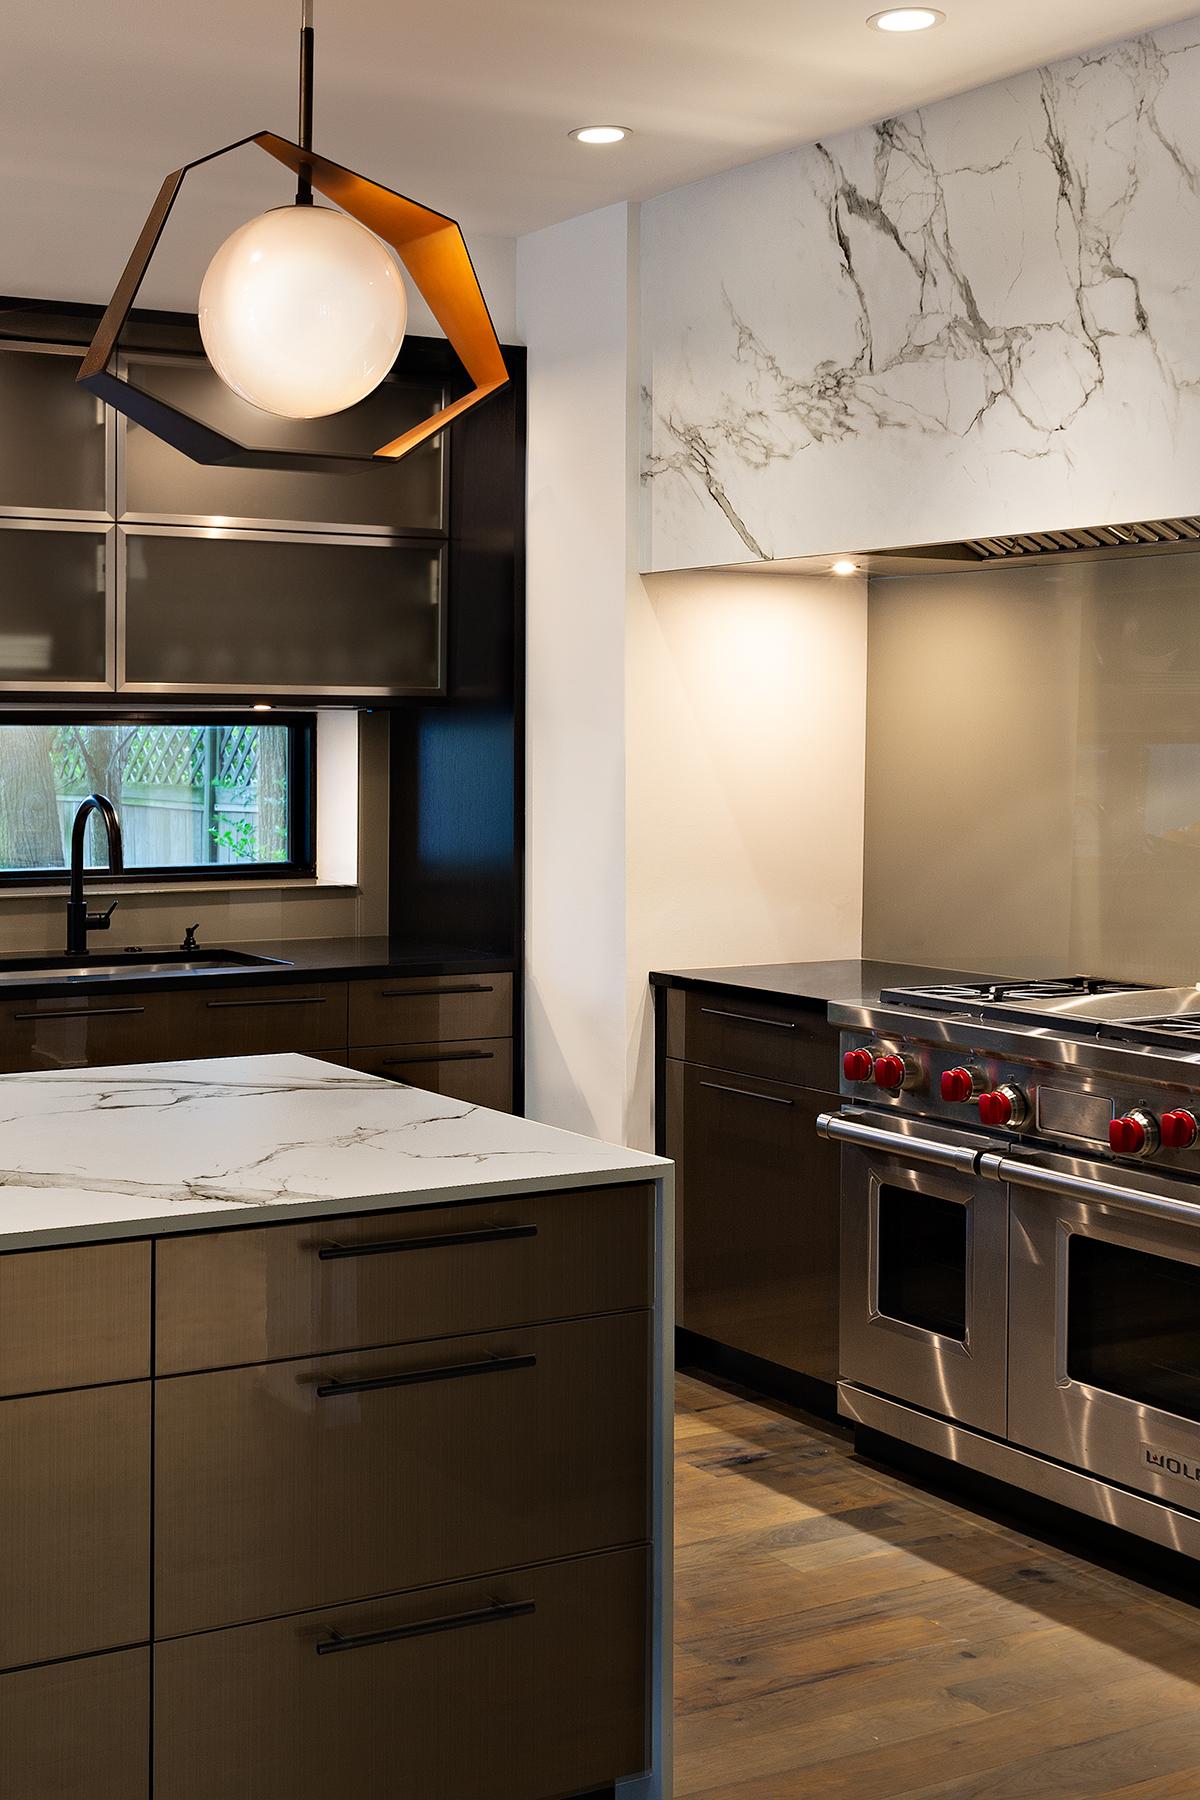 sq-kitchen-1.jpg